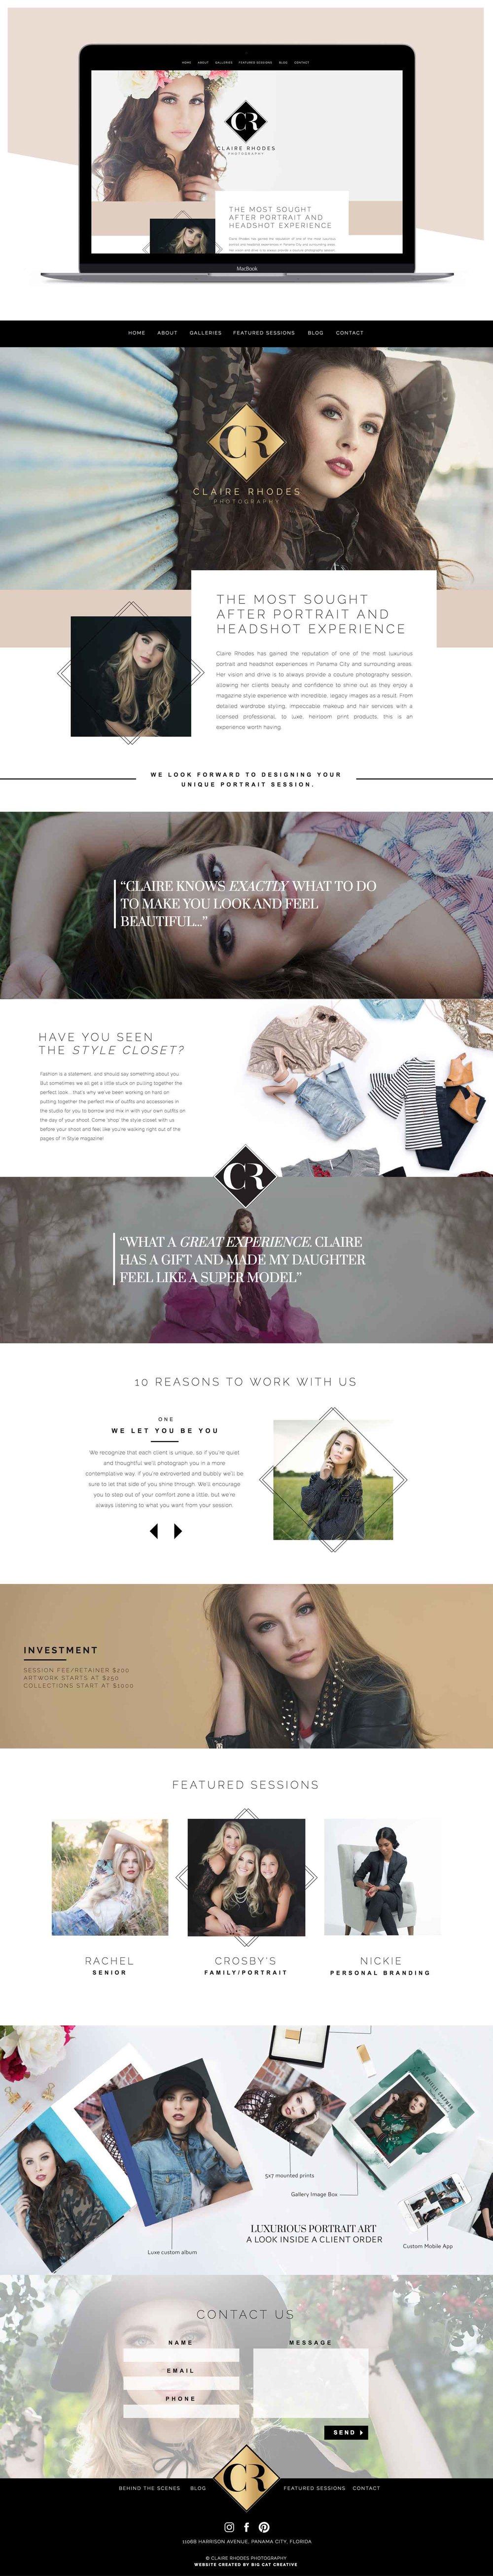 Claire-Rhodes-Showit-Website-Design-by-Big-Cat-Creative.jpg